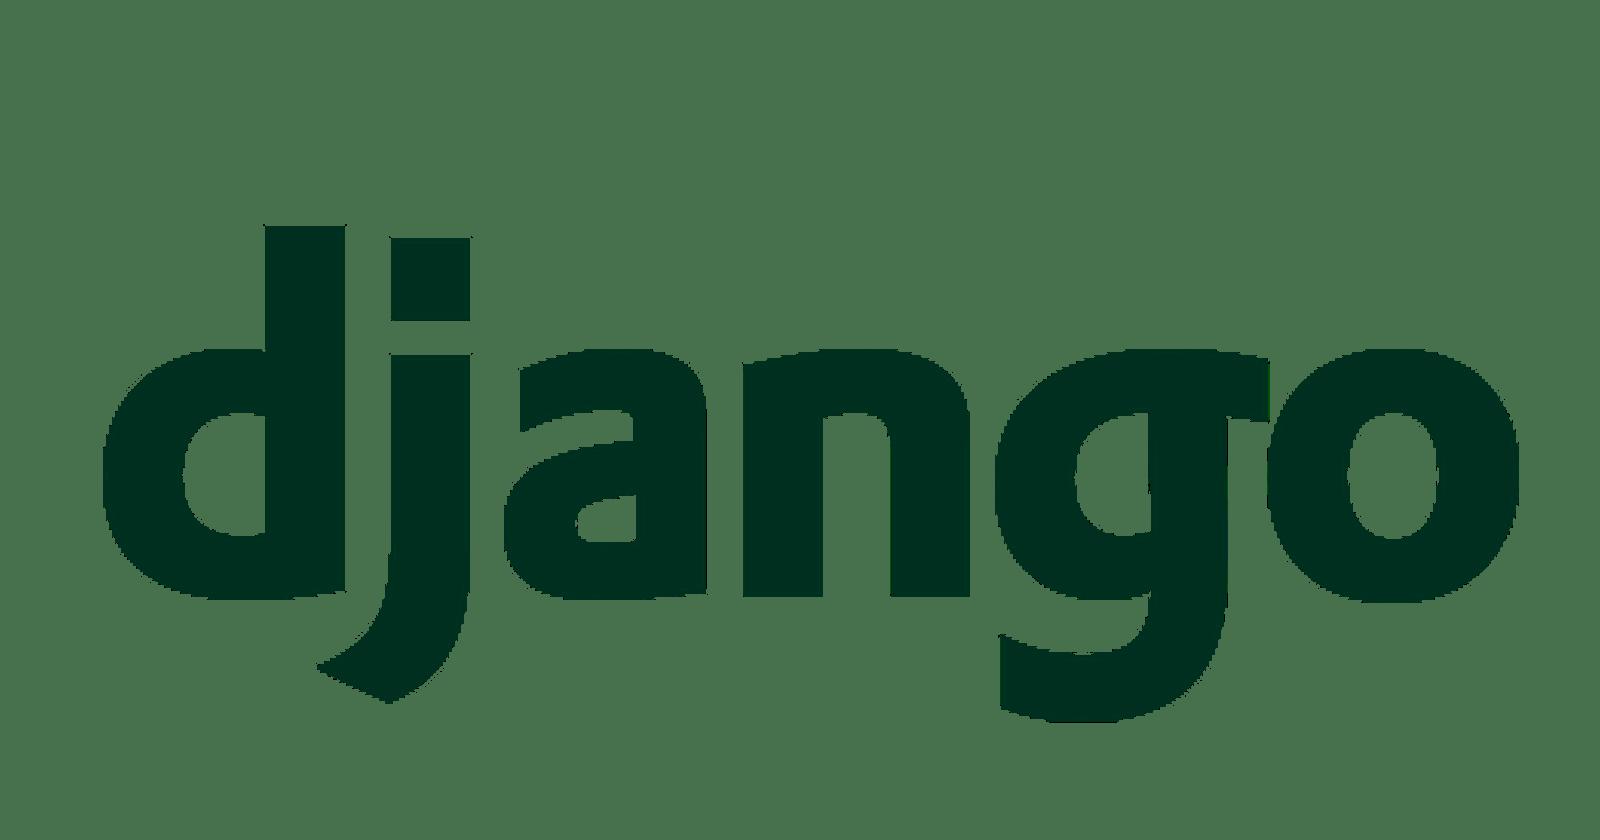 First steps with Django - Part 1